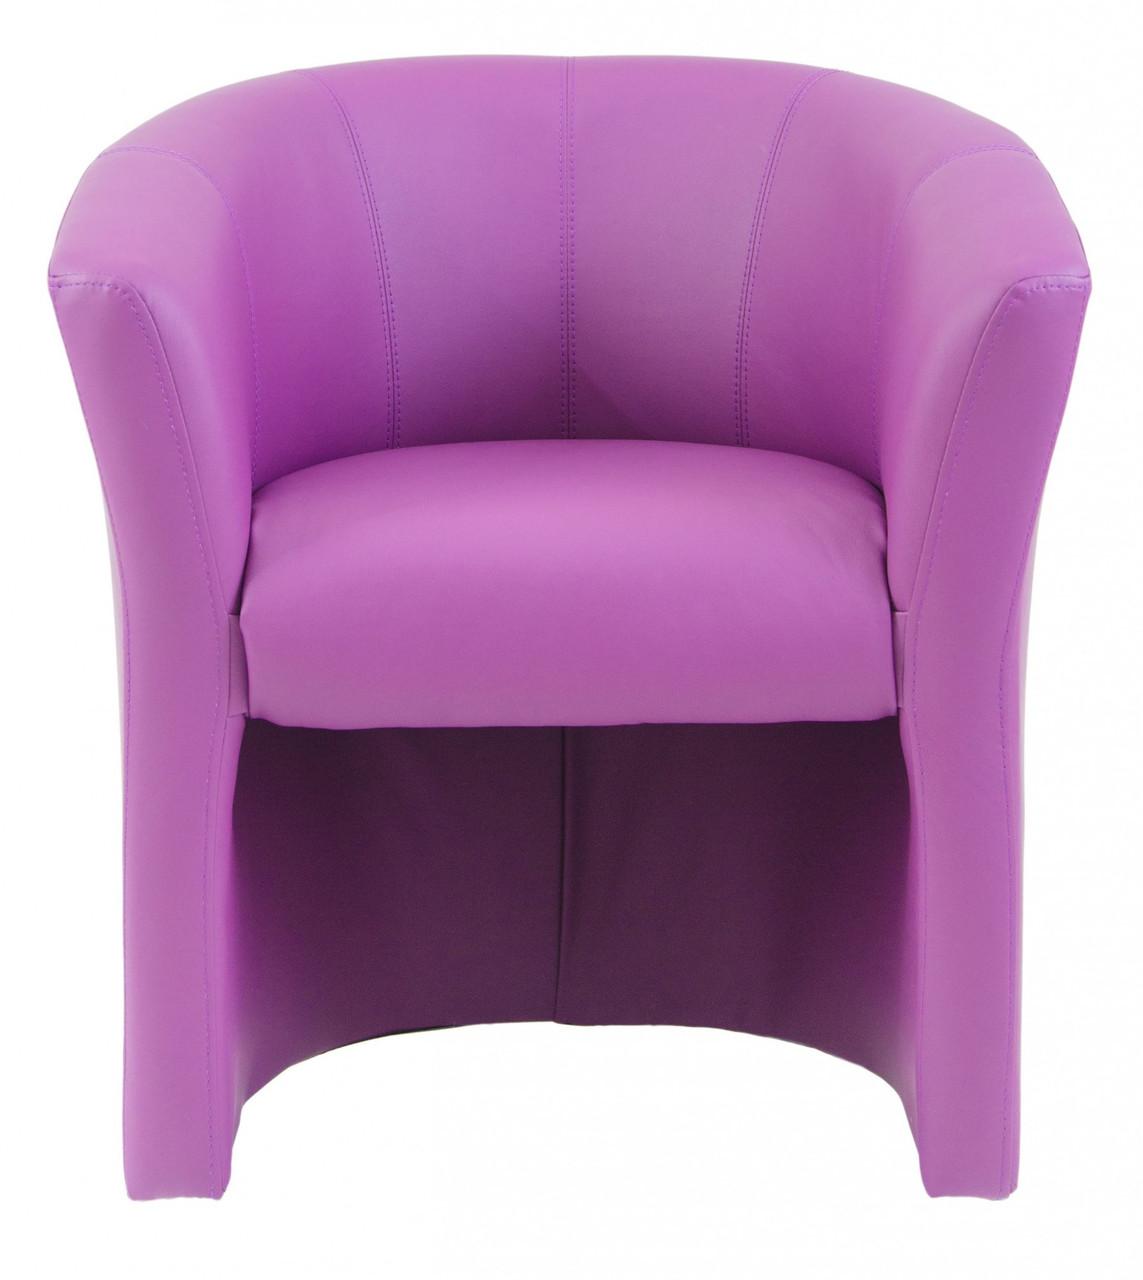 Кресло Boom 650 x 650 x 800H см Fly 2217 Сиреневое